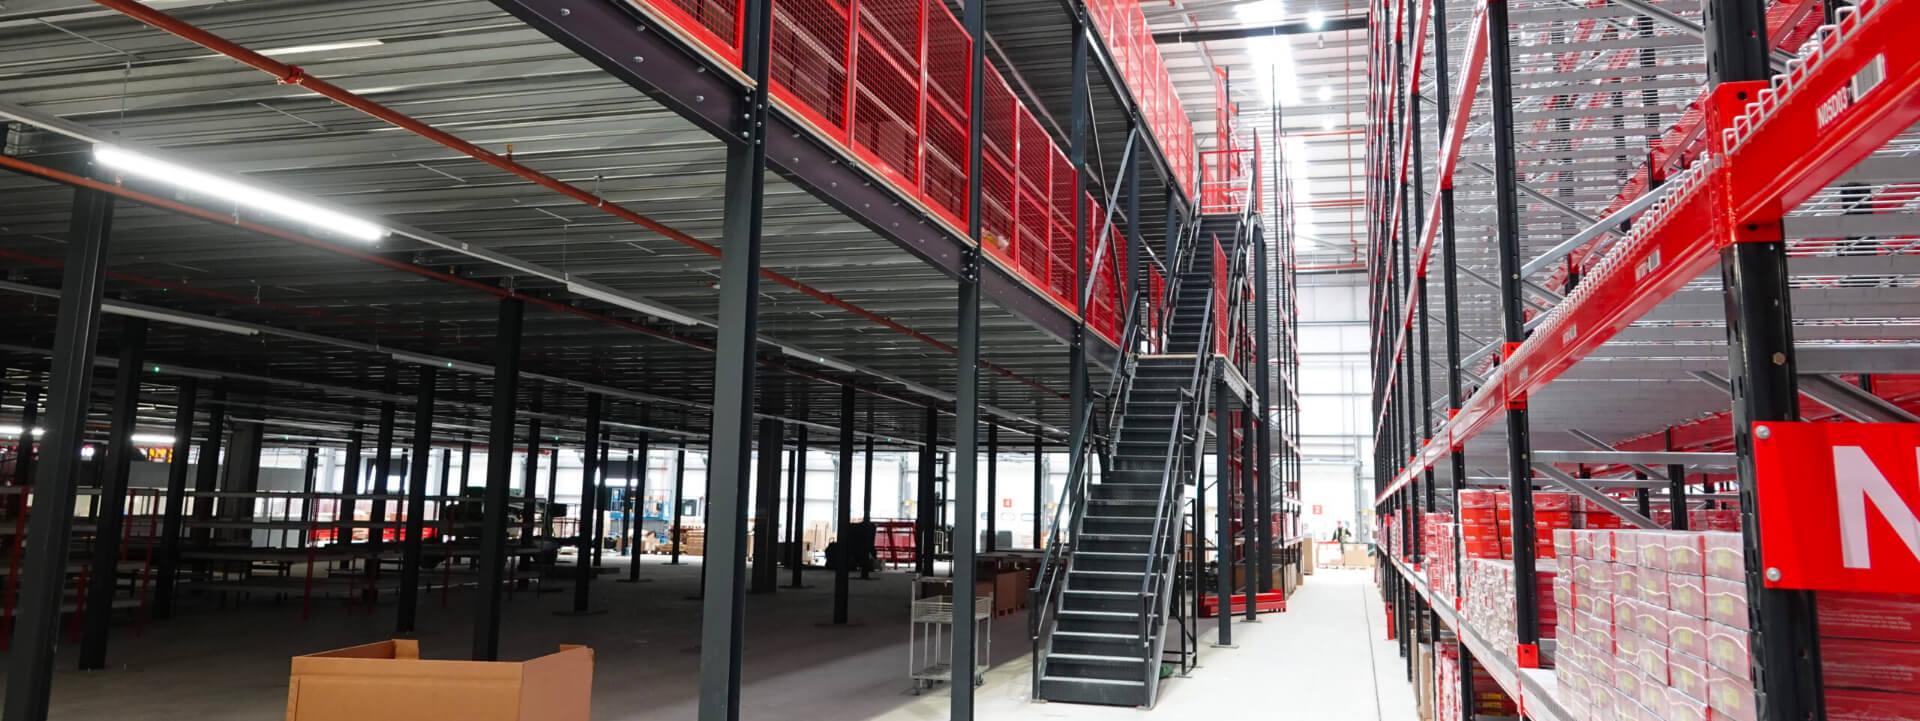 Mezzanine Flooring With Stairs